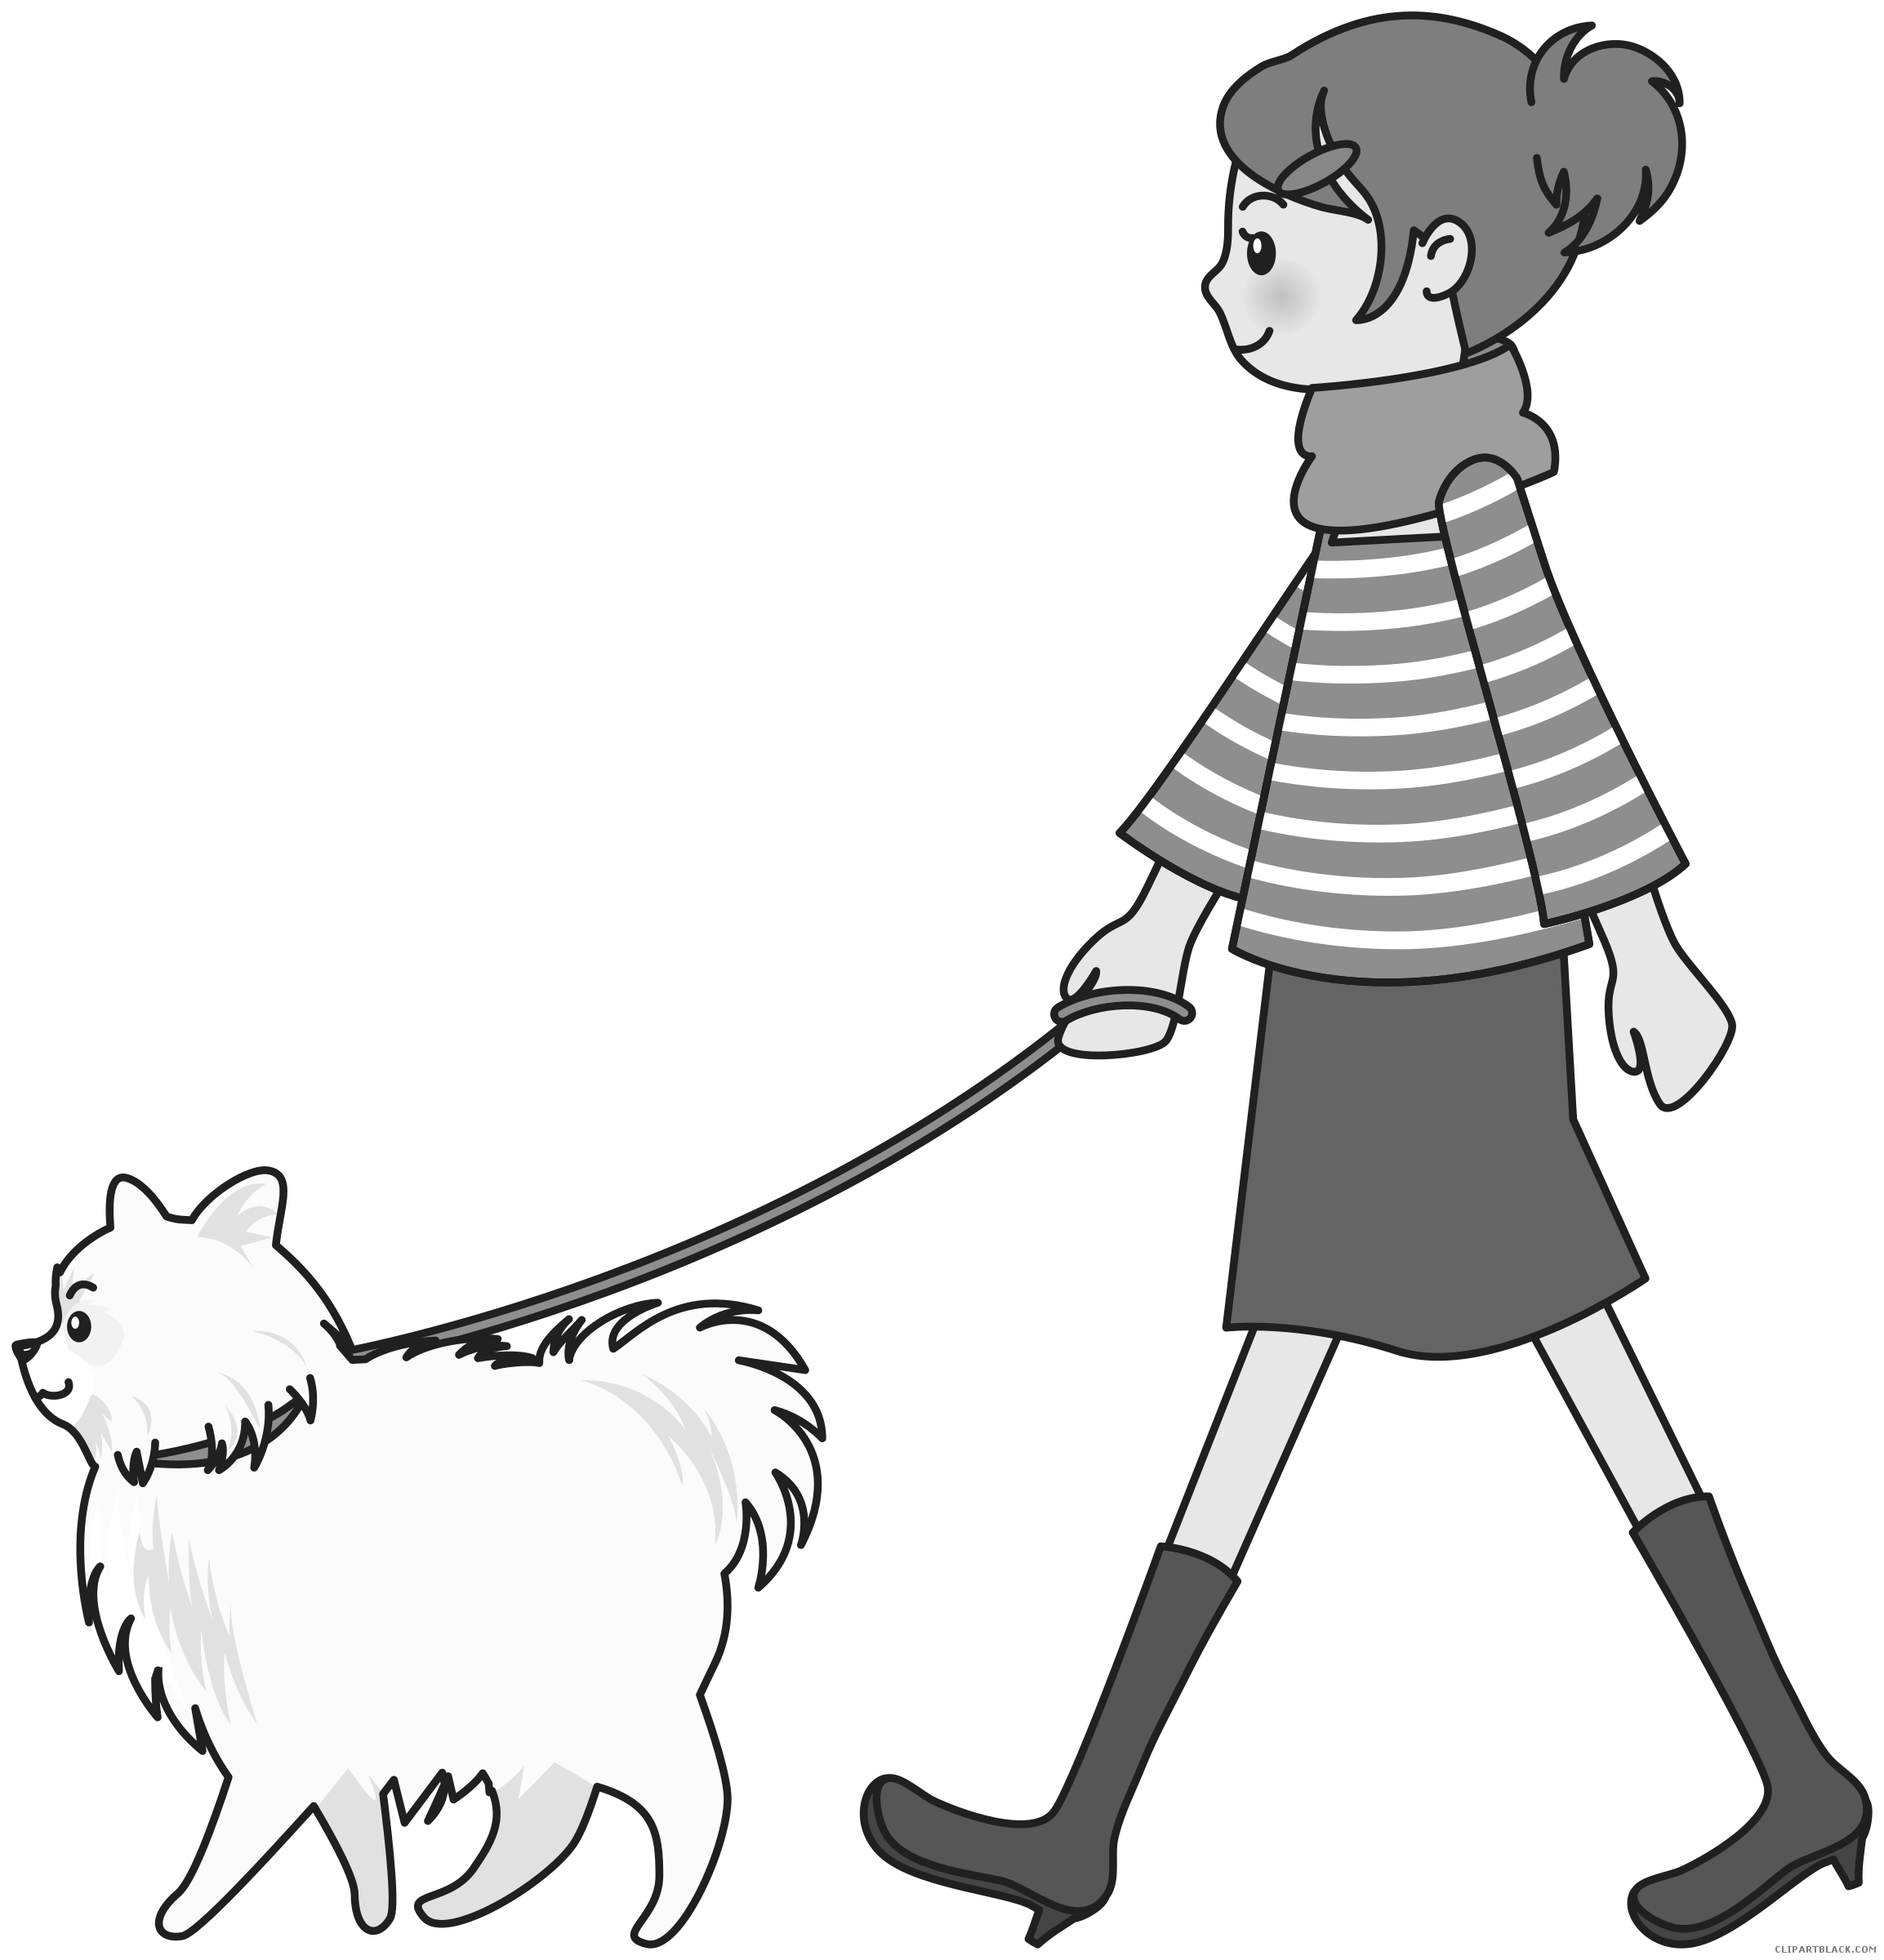 Free clipart dog walking clip art free stock Walking Dog Clipart - Page 2 of 3 - ClipartBlack.com clip art free stock